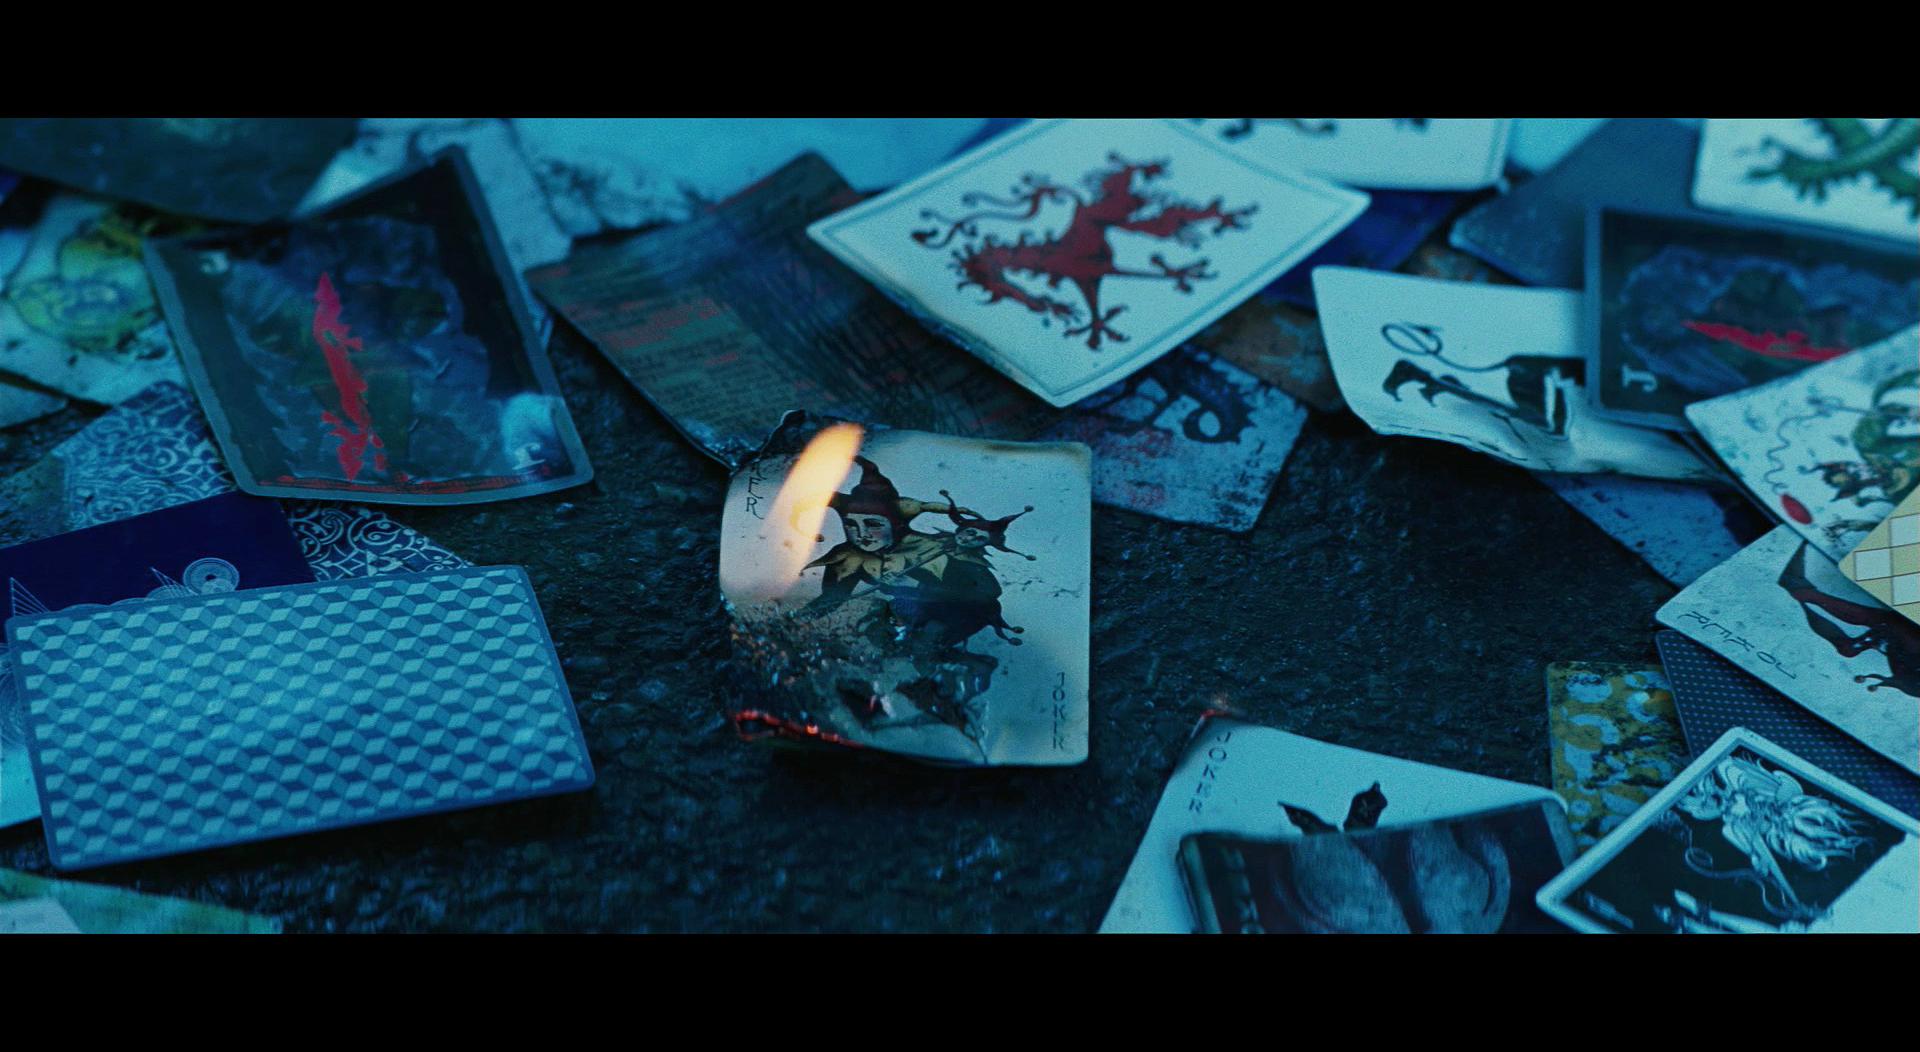 Heath Ledger The_Joker__s_Card_by_Grudg3